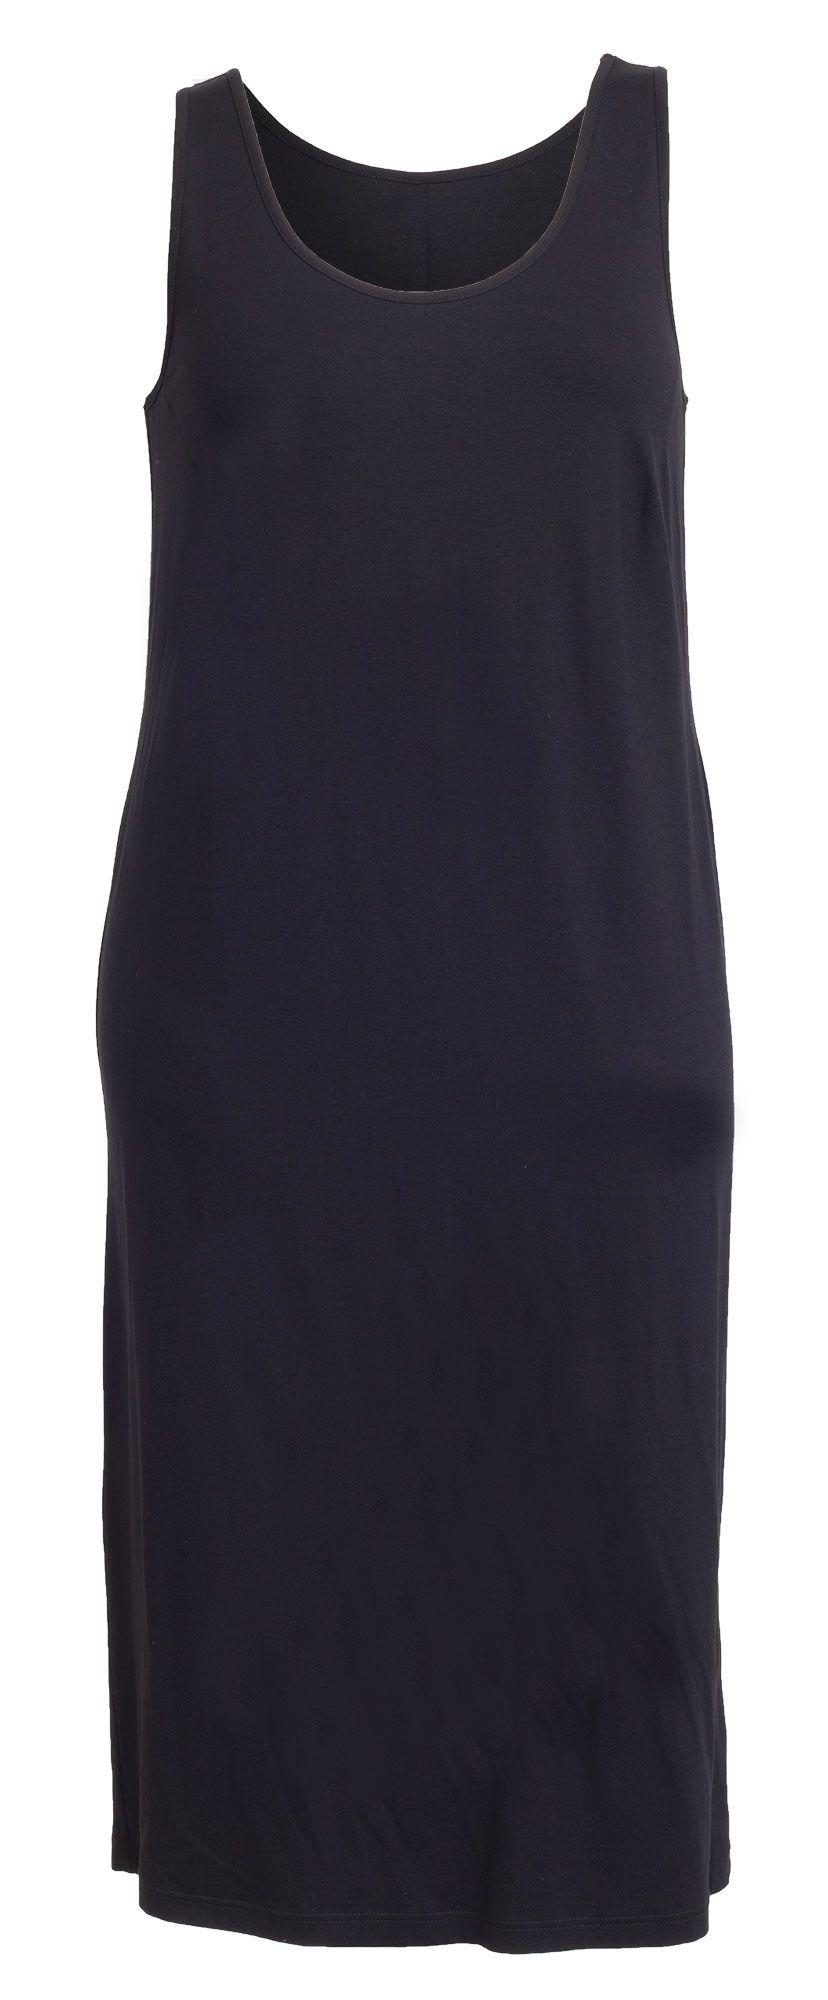 Q`neel Sort Mega Størrelser Store Kjole Modetøj Cool Lang Jersey I 6w7w8fEq